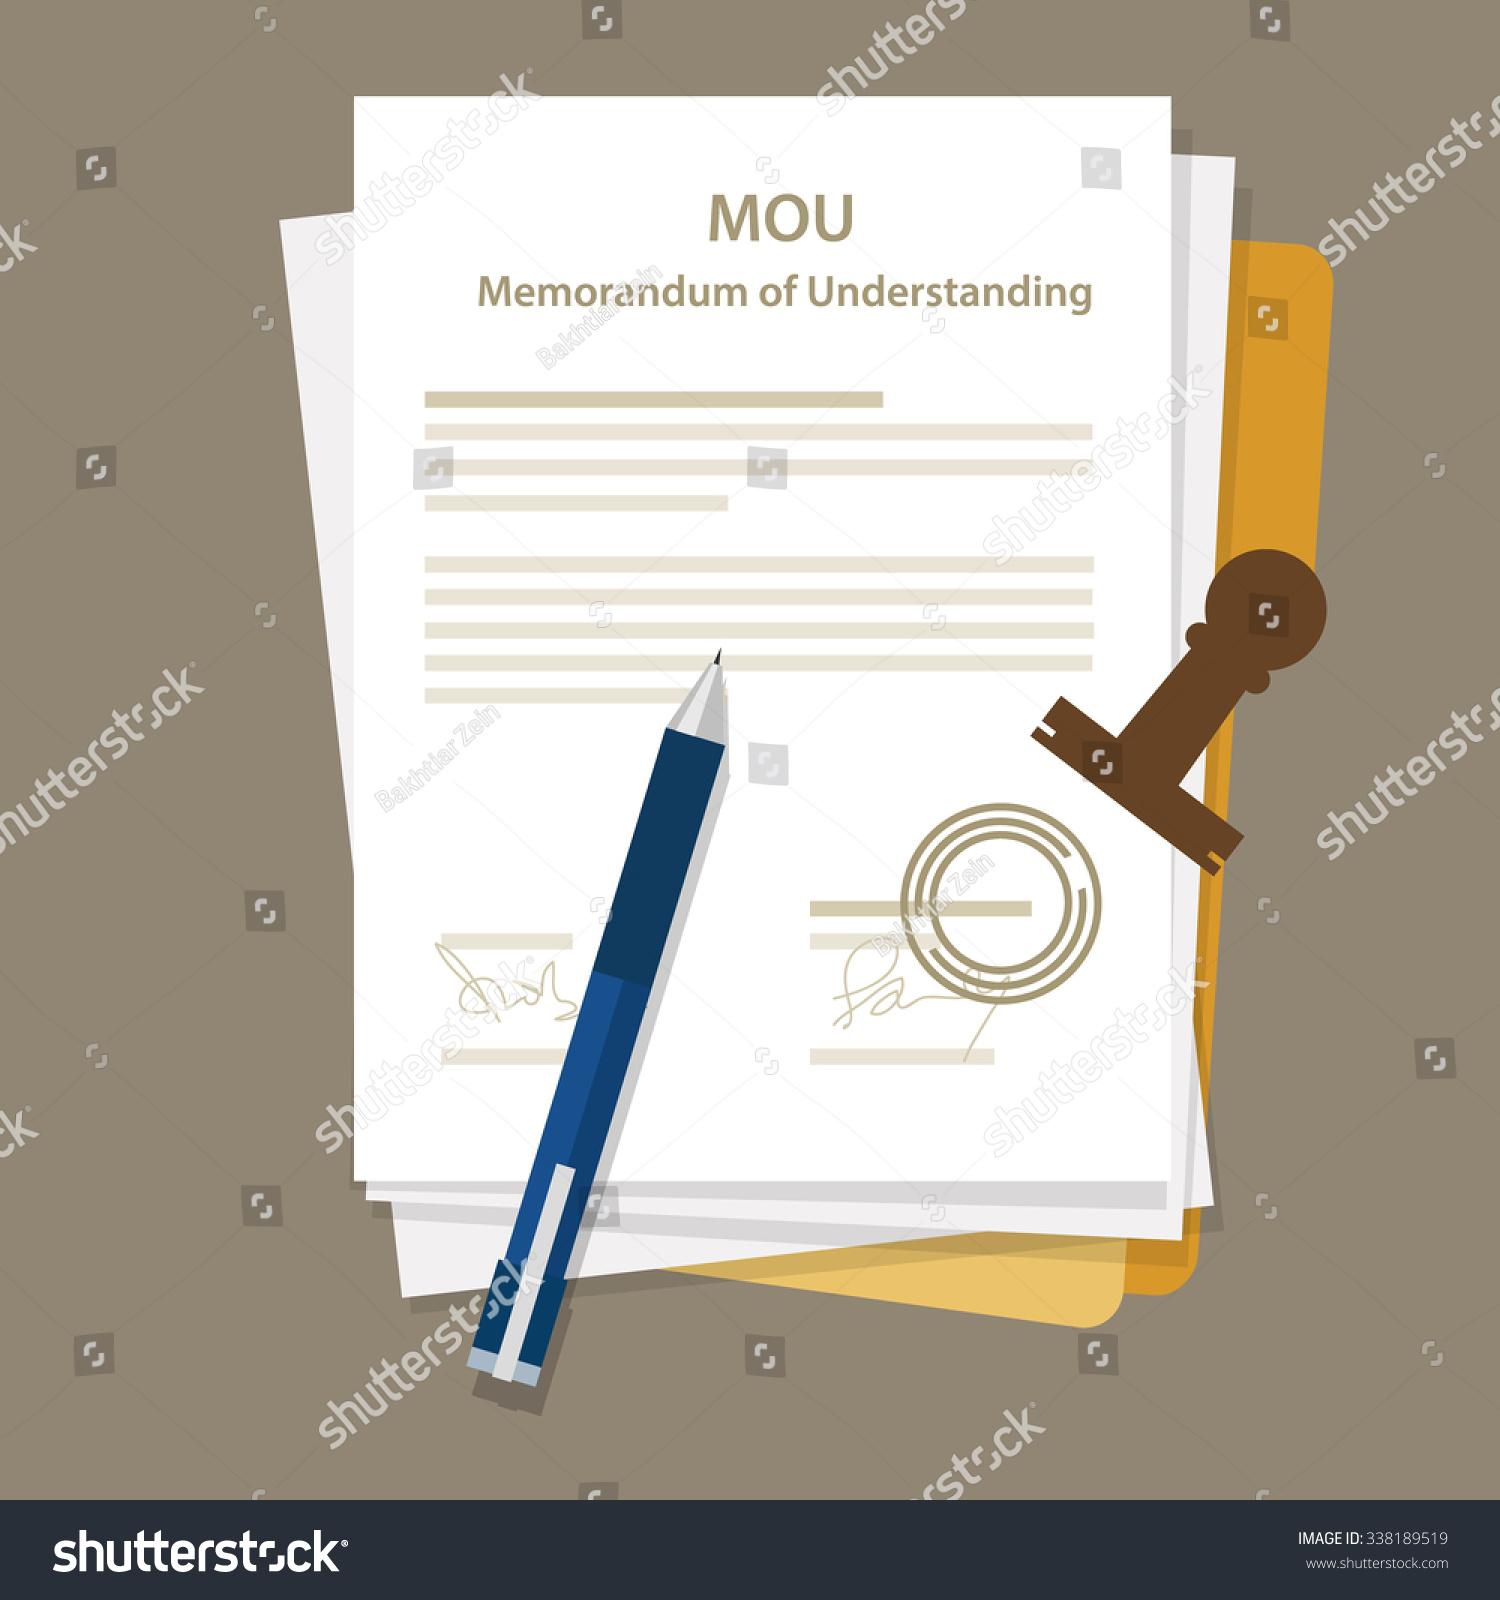 mou memorandum understanding legal document agreement stock vector mou memorandum of understanding legal document agreement stamp seal